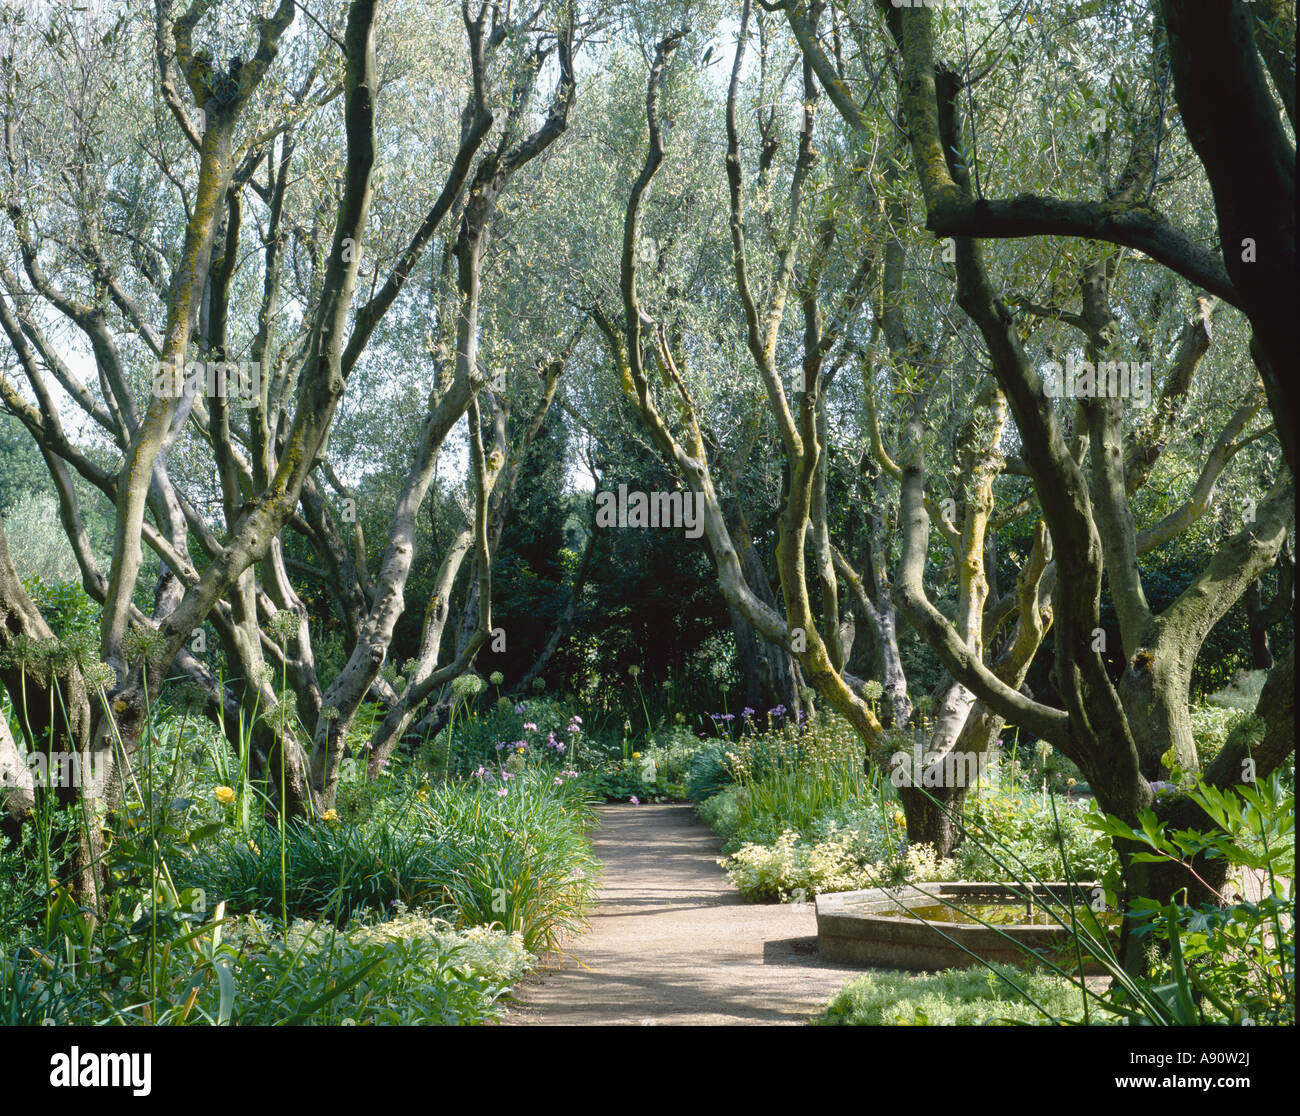 The garden of la landriana giardini della landriana for Garden giardini